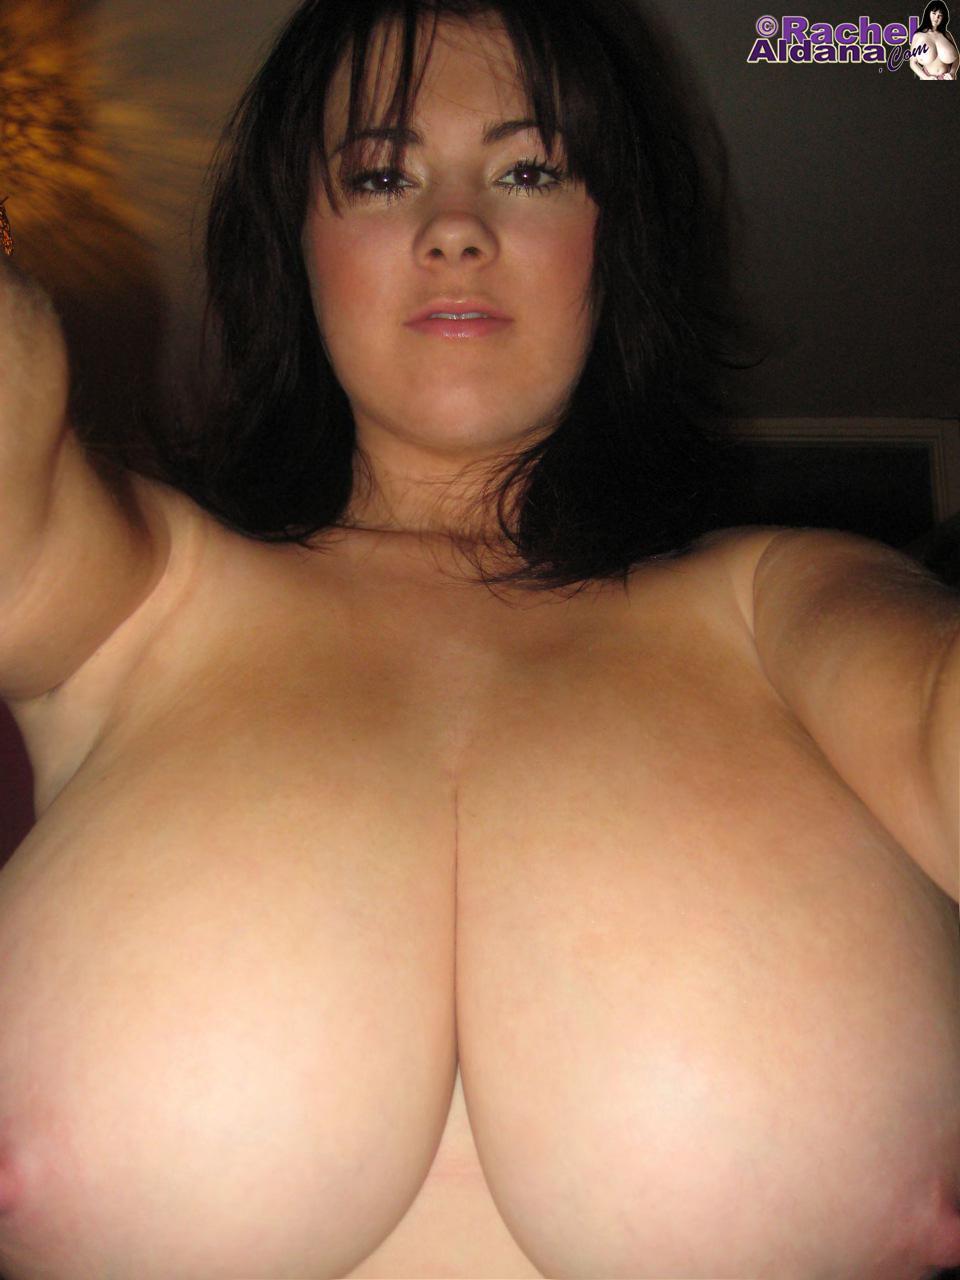 Rachel aldana big tits